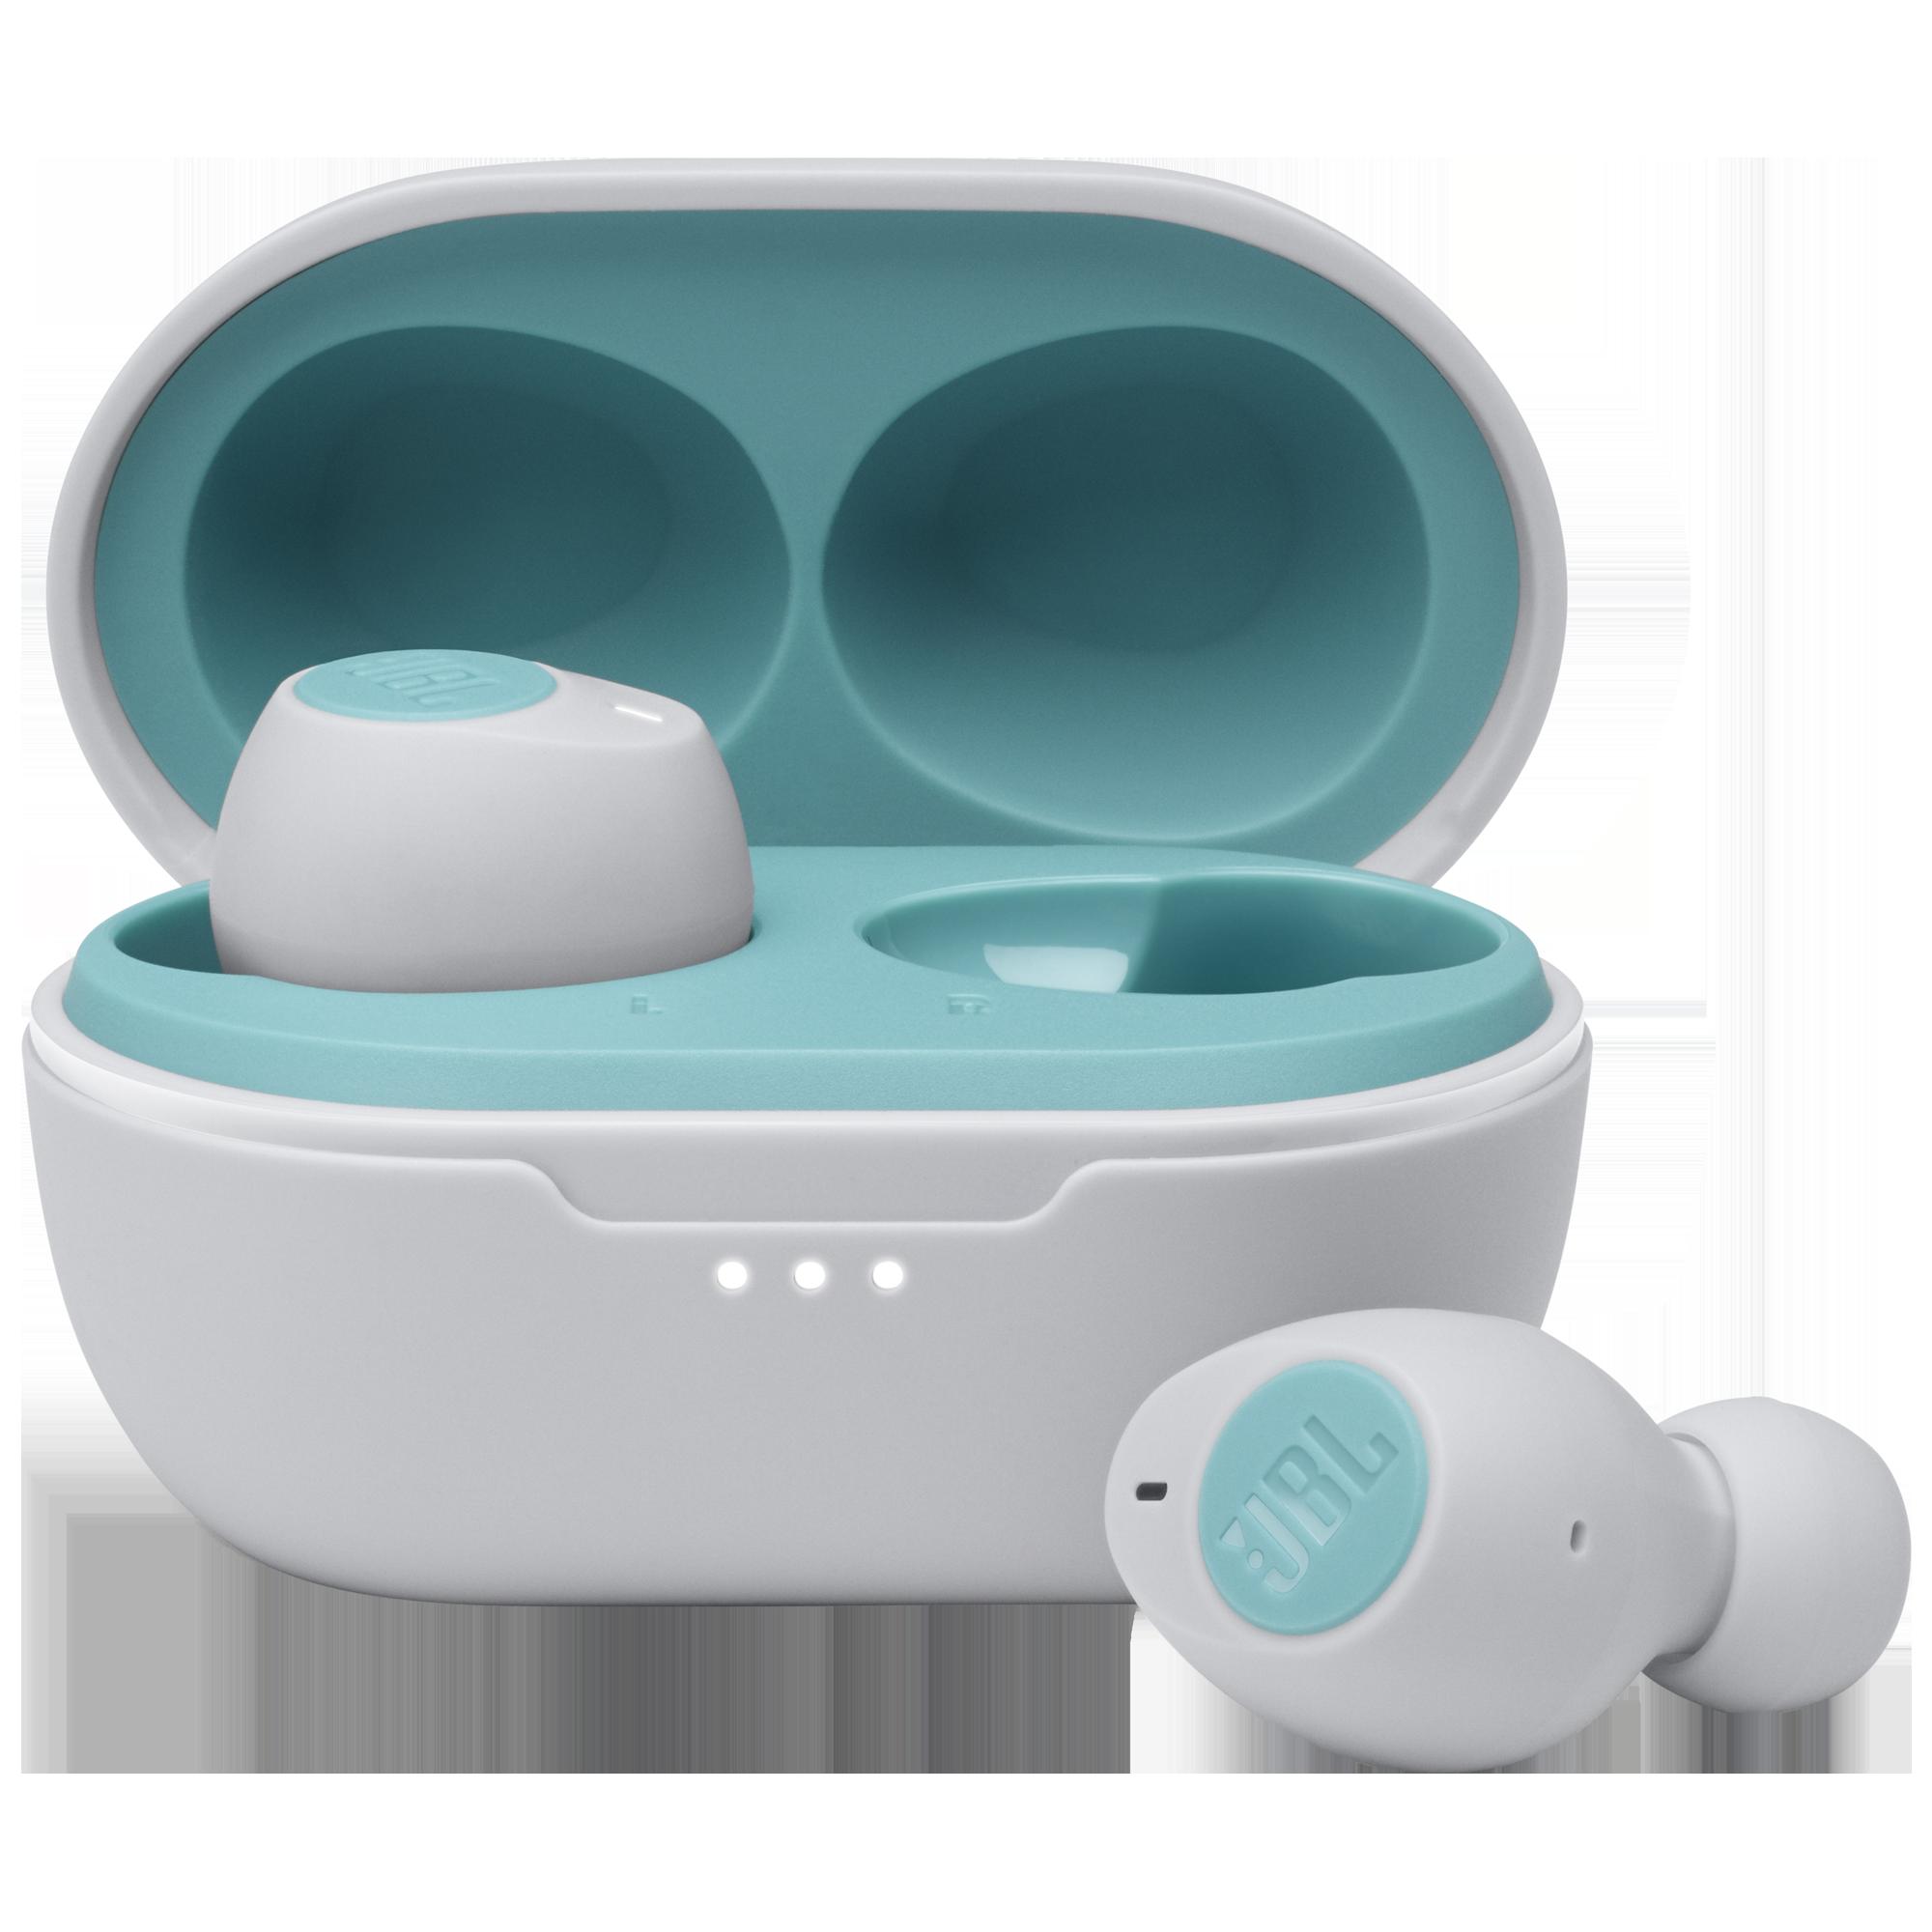 JBL Tune 115TWSIn-Ear Truly Wireless Earbuds with Mic (Bluetooth 5.0, Voice Assistant, JBLT115TWSBLU, Blue)_1